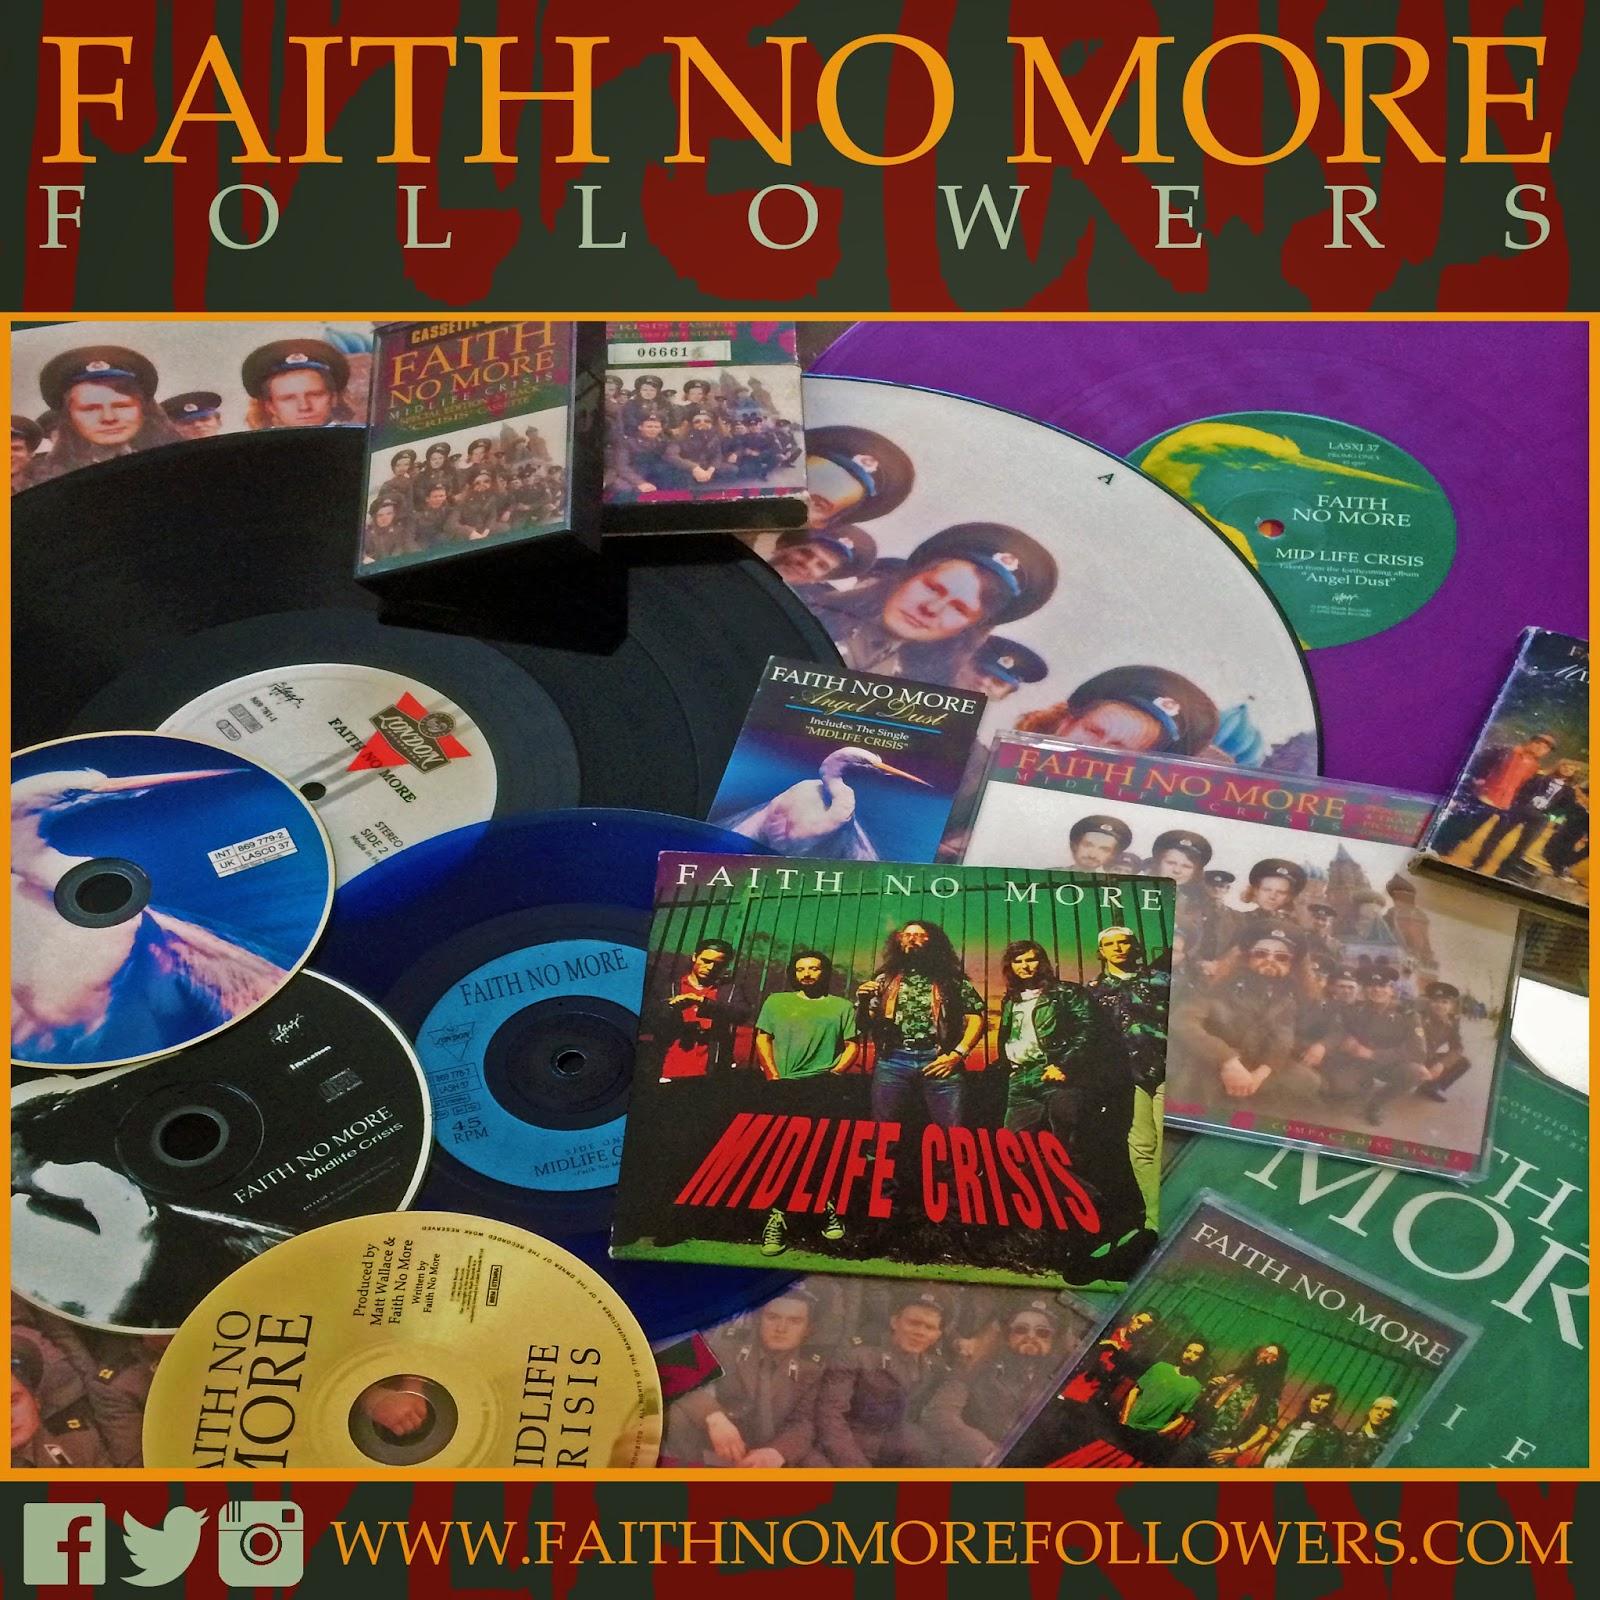 Faith No More - Midlife Crisis Lyrics | Musixmatch